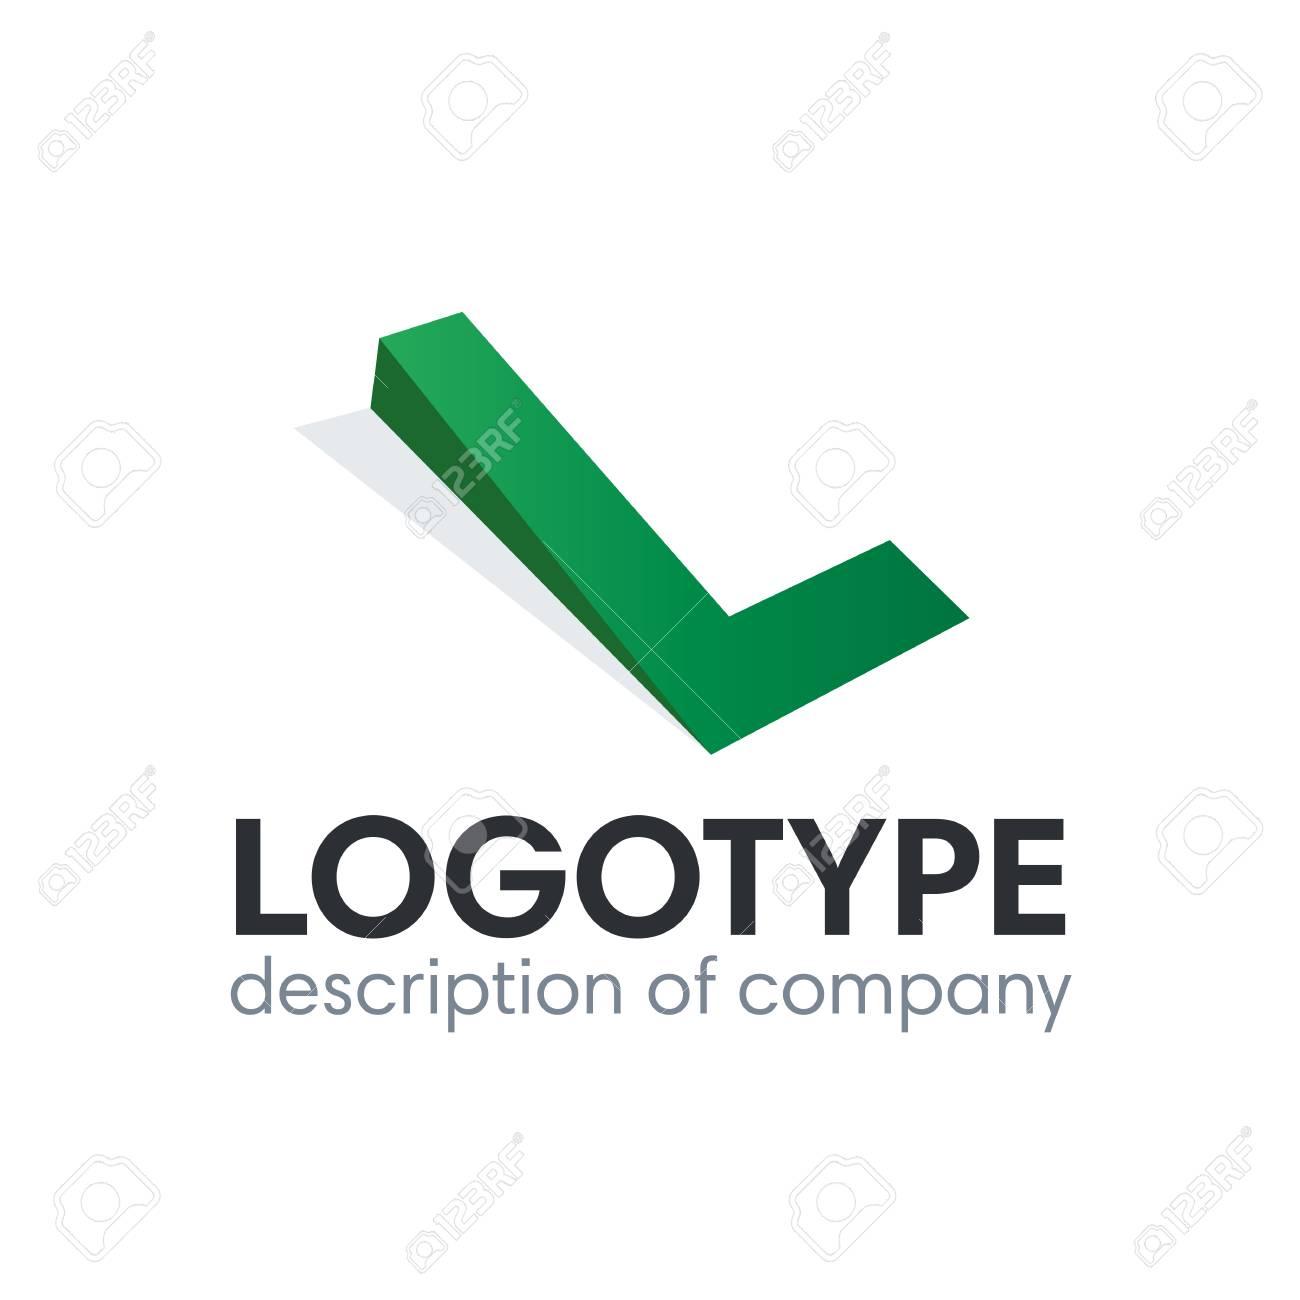 Letter L logo icon design template elements - 84049333